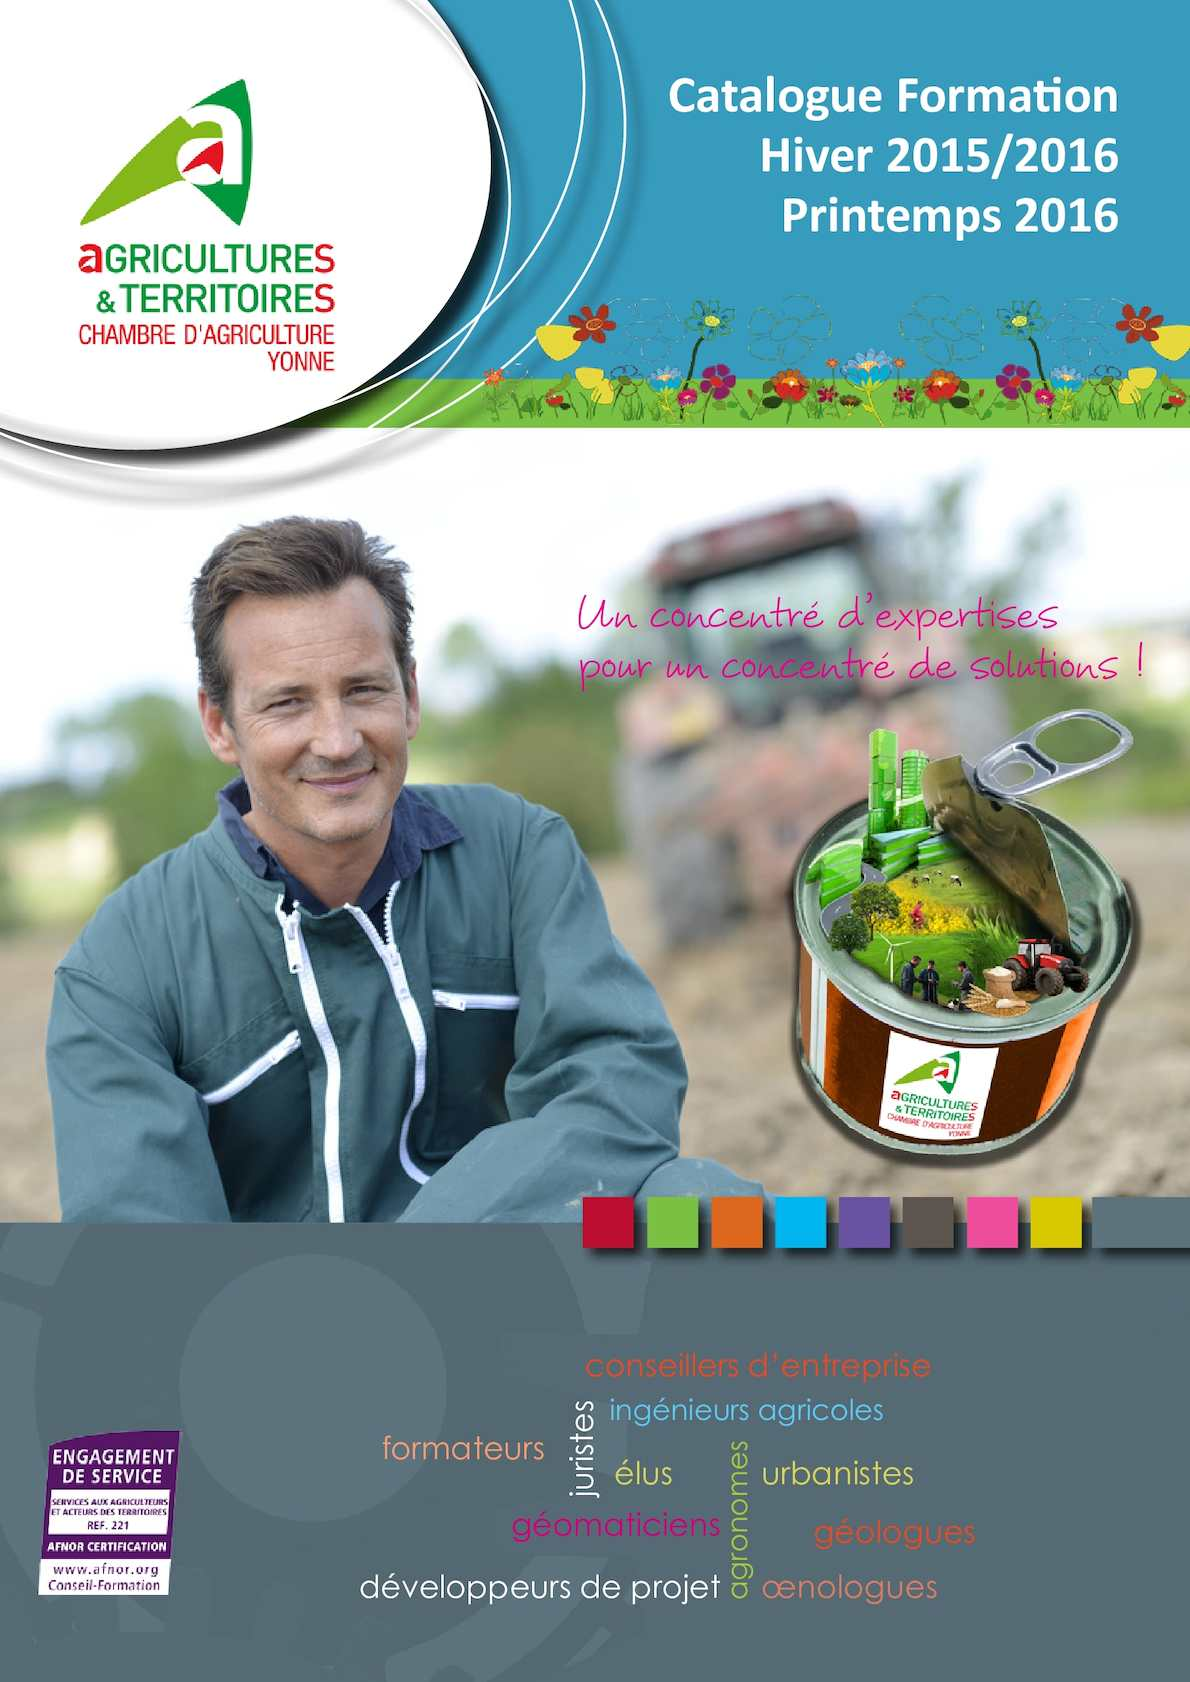 Calam o catalogue hiver 2015 printemps 2016 - Chambre agriculture yonne ...